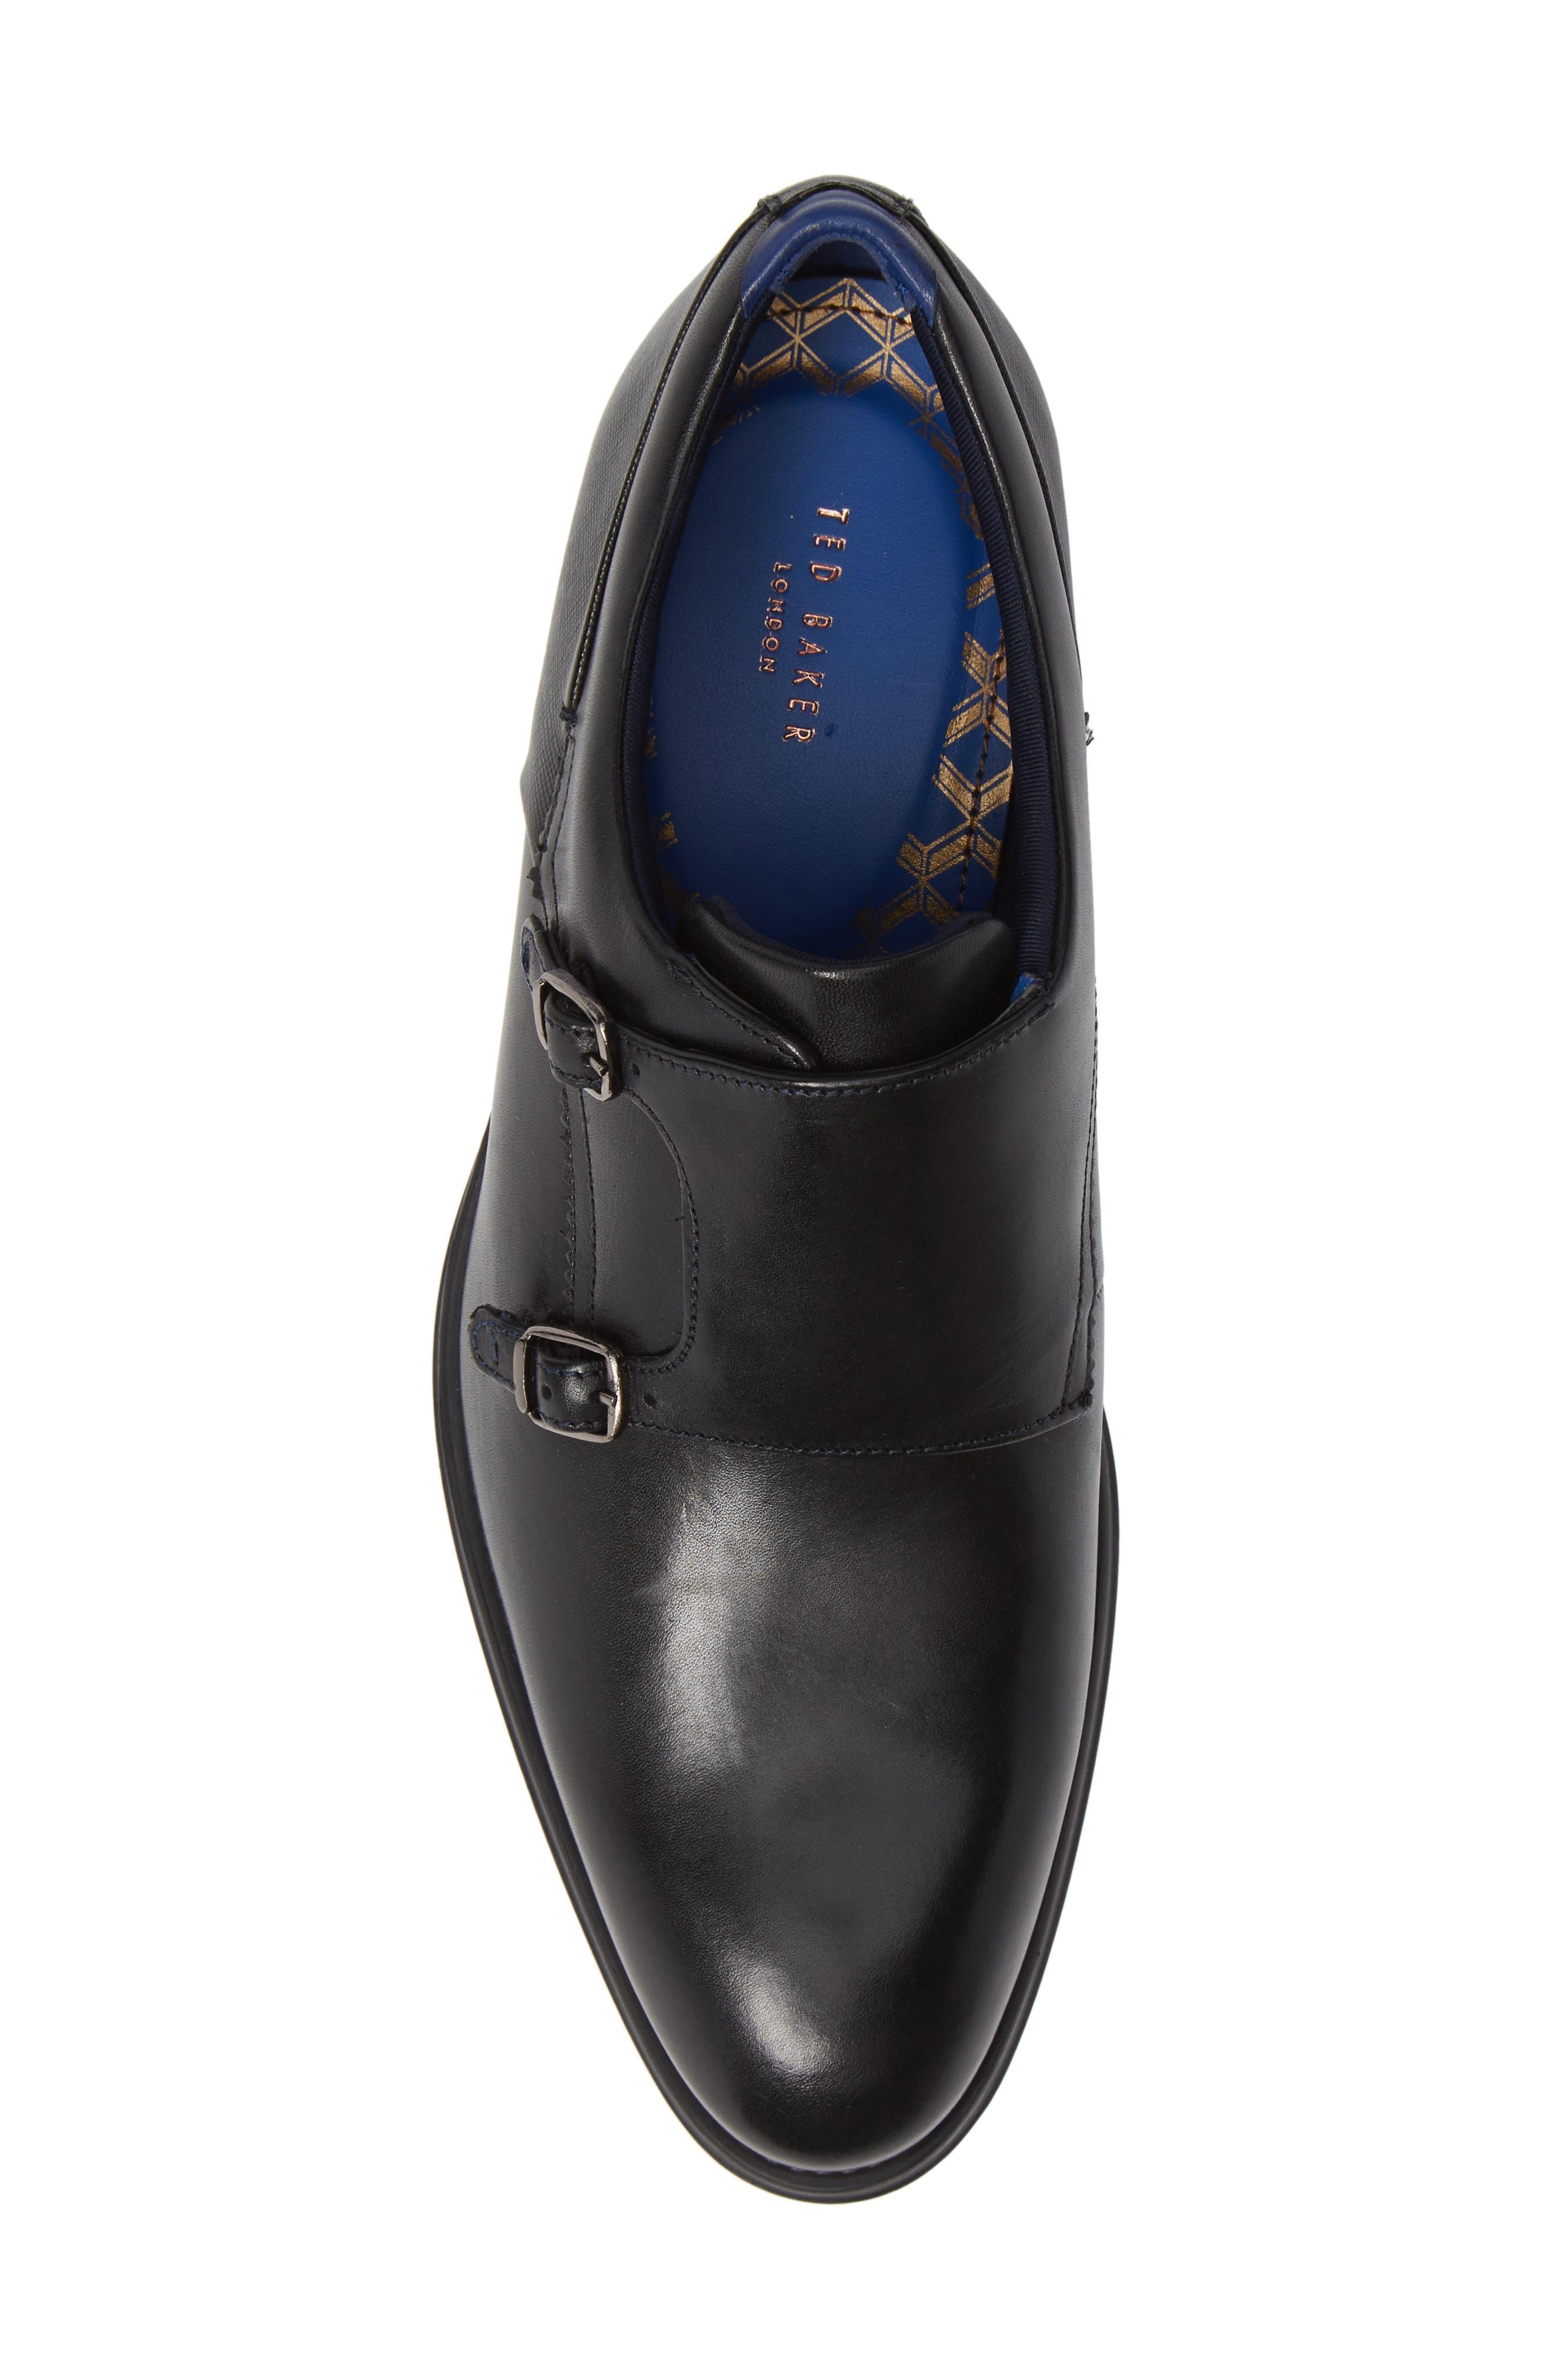 TED BAKER LONDON, Cathon Double Buckle Monk Shoe, Alternate thumbnail 5, color, BLACK LEATHER